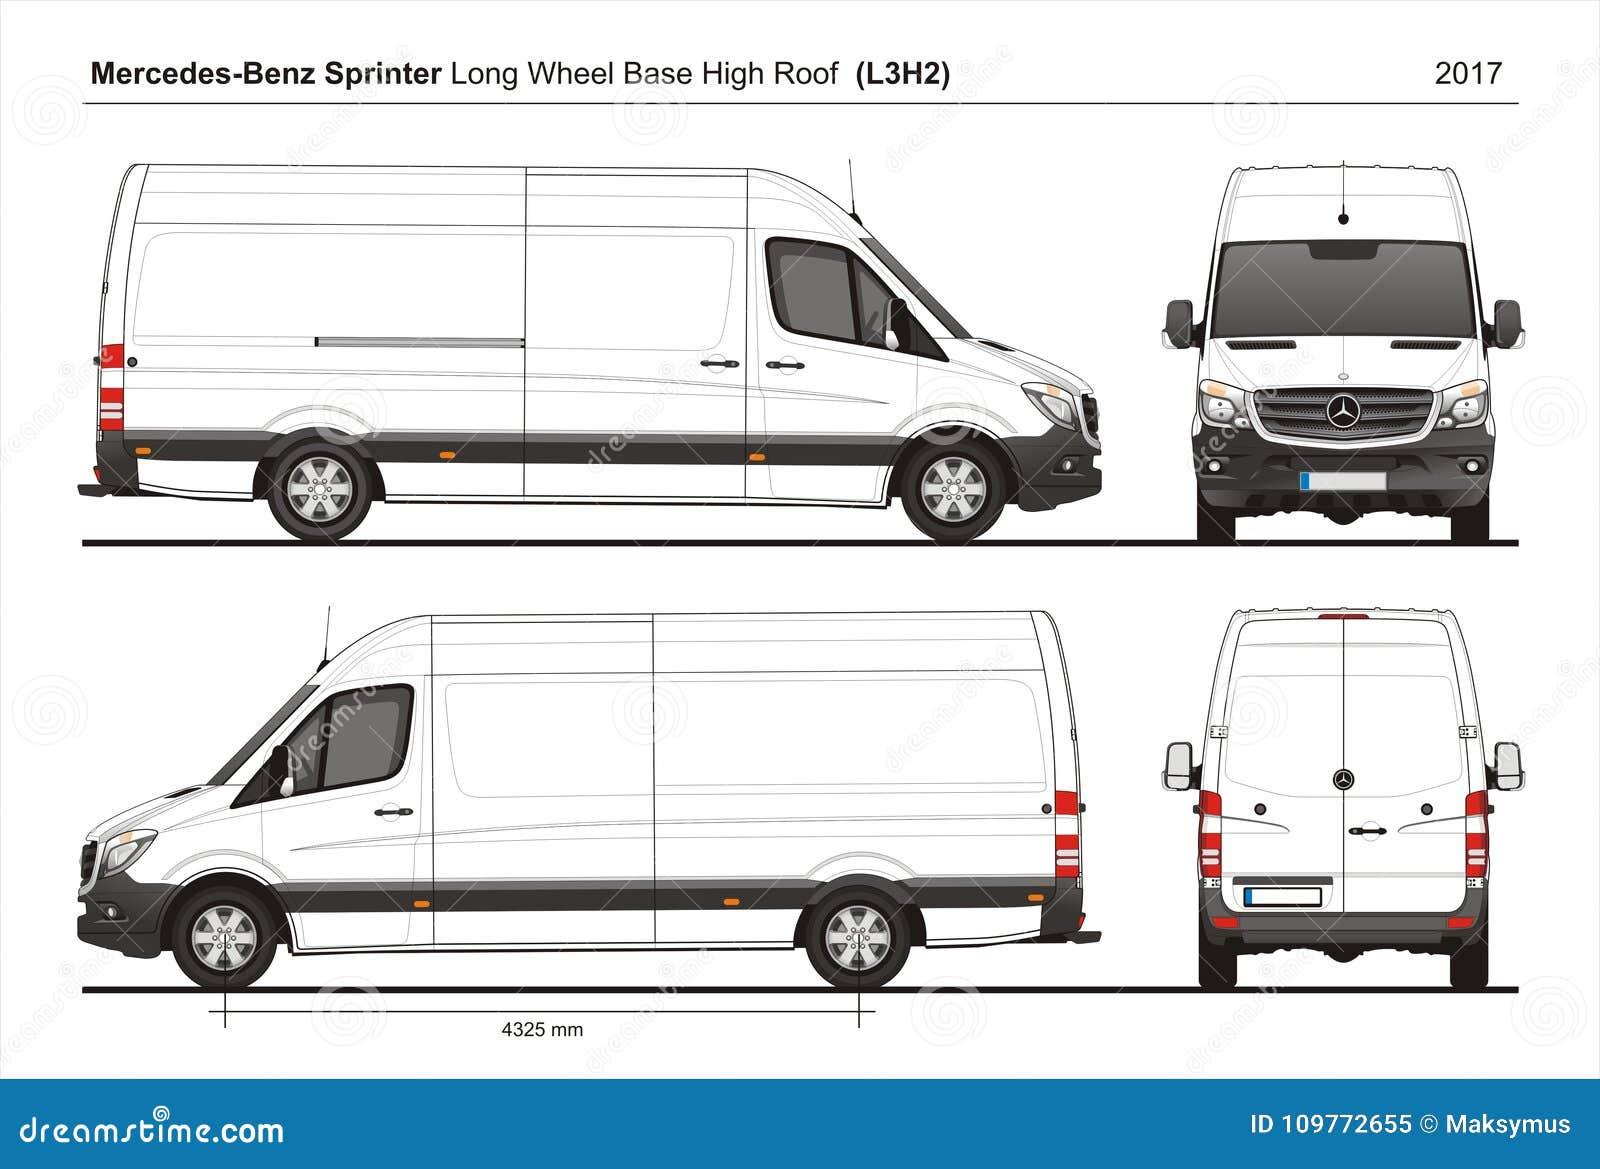 Mercedes Sprinter Lwb High Roof Cargo Van L3h2 2017 Editorial Image